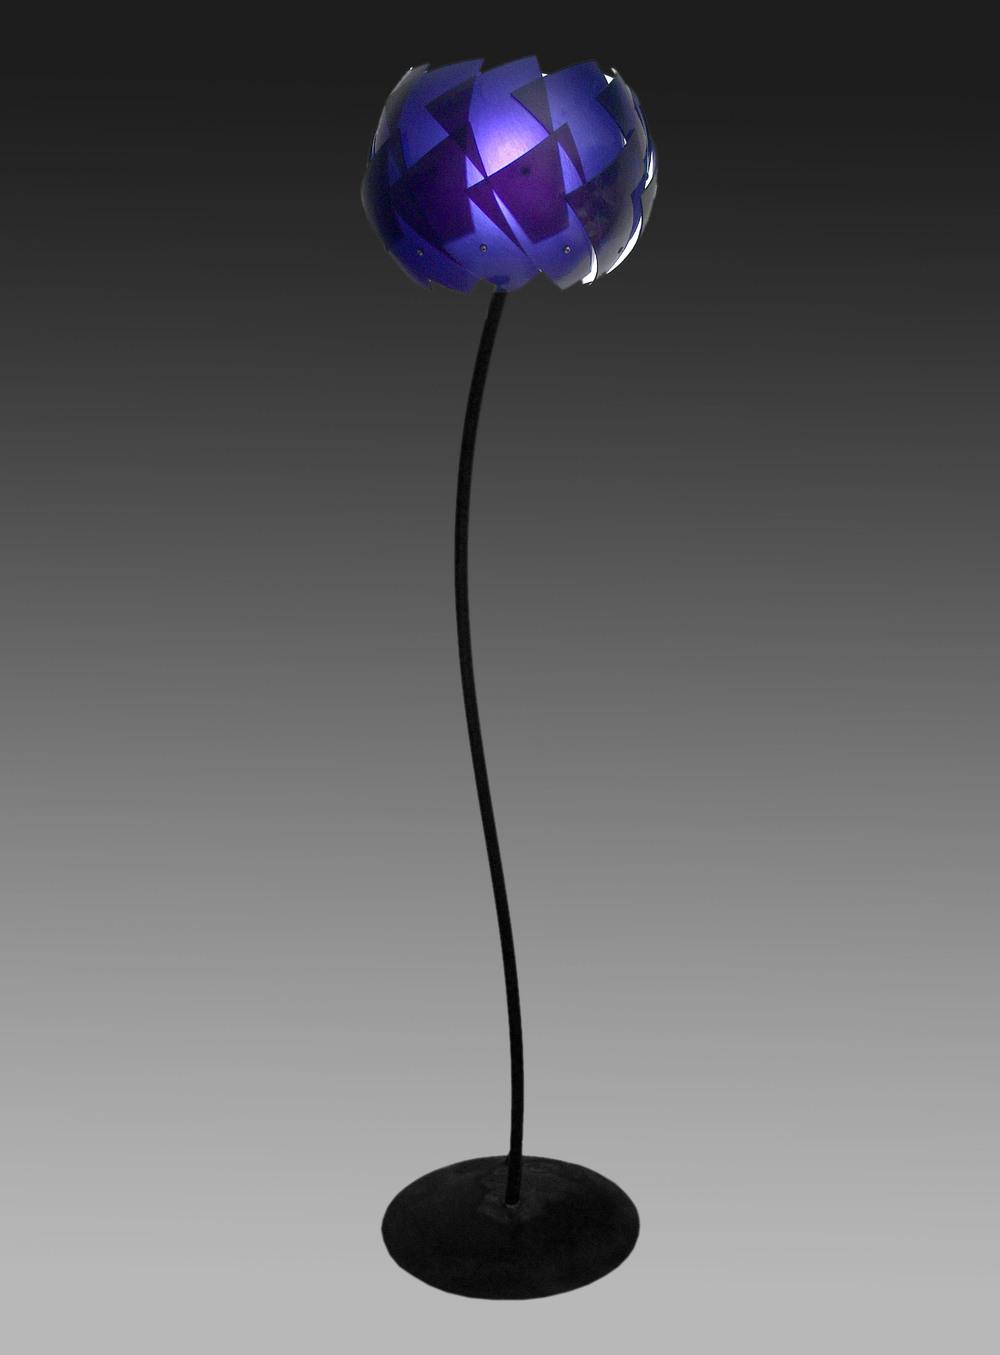 Tulip-1-01.JPG